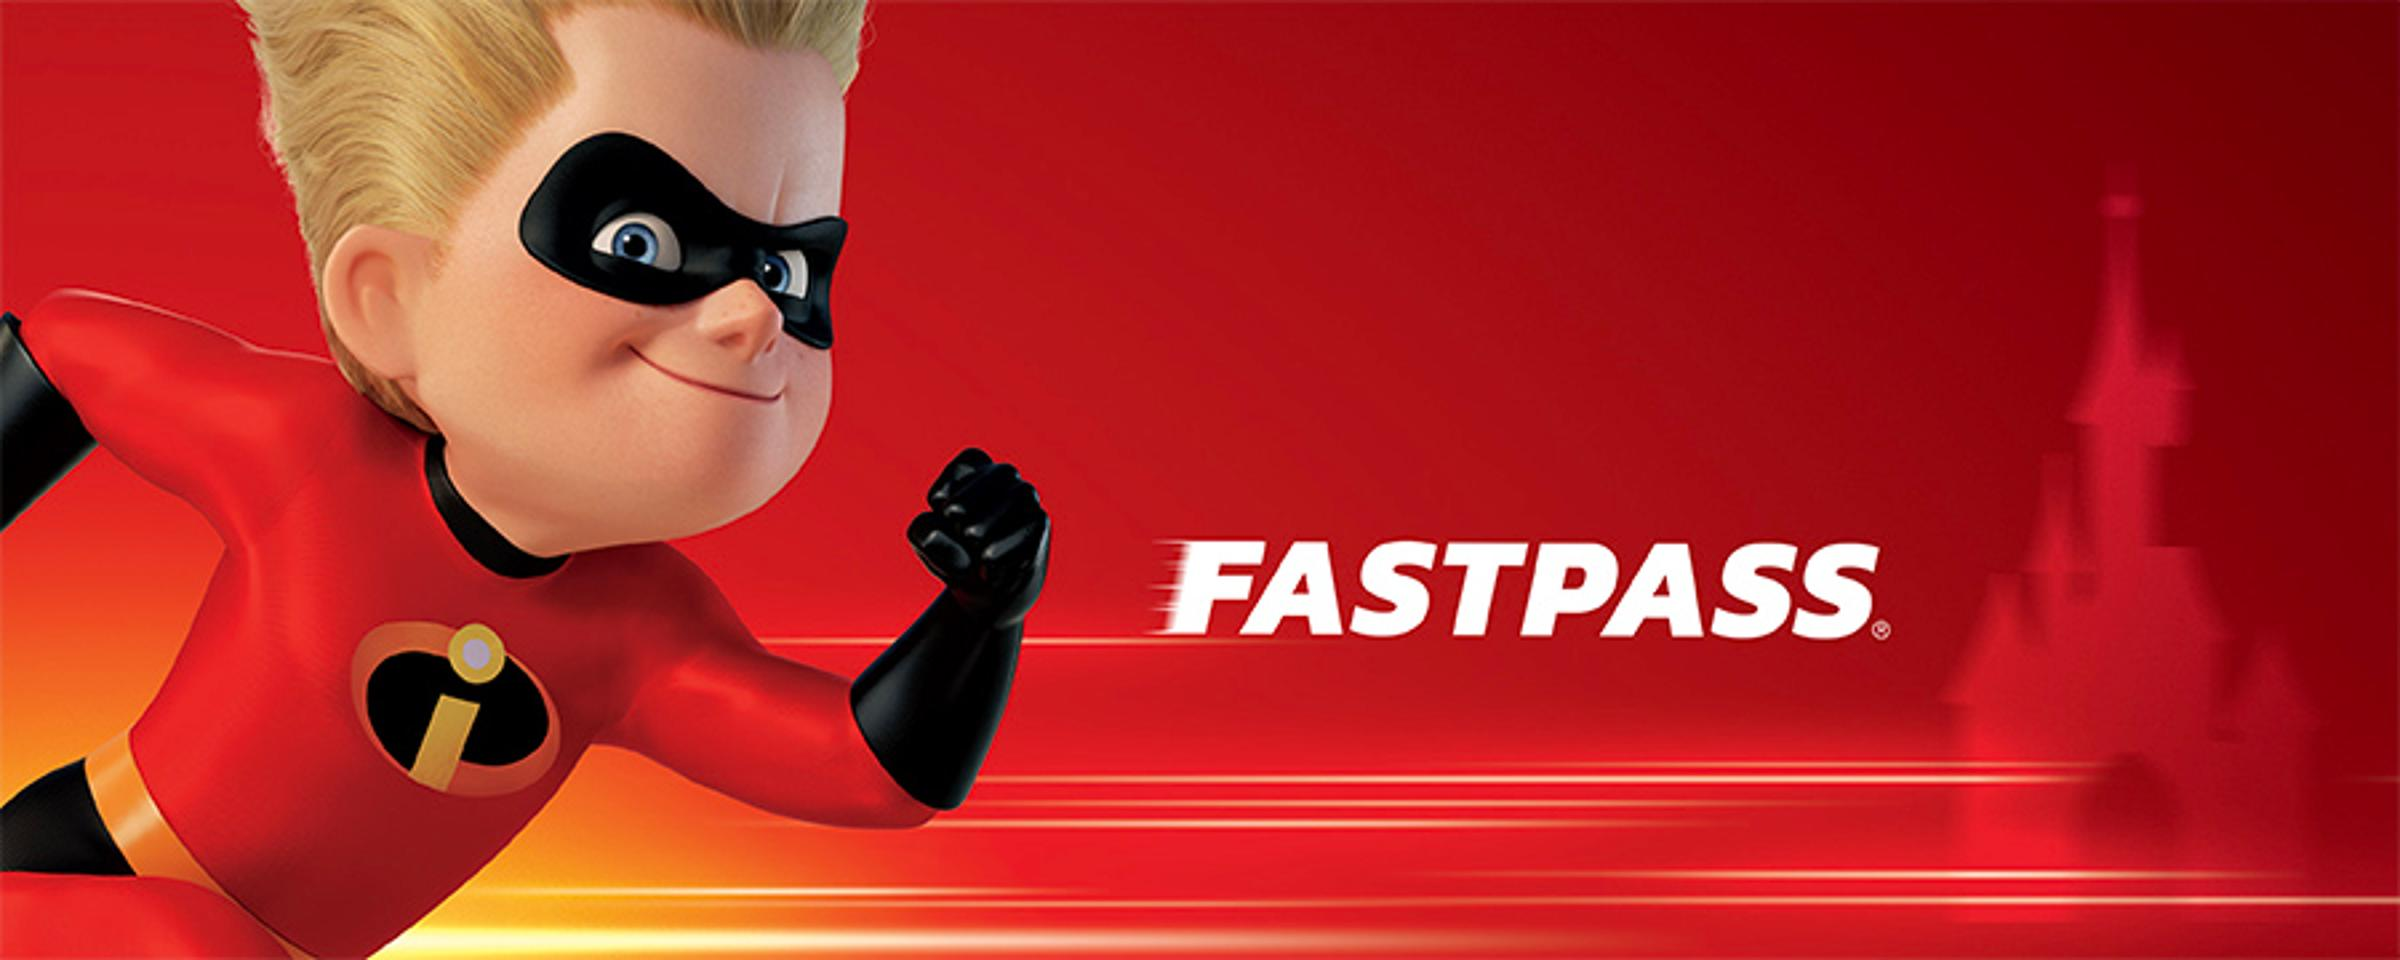 hd14188_2050dec31_world_fastpass-new-range-key-visual-dash-castle_900x360_tcm752-179287$w_2400$p_1